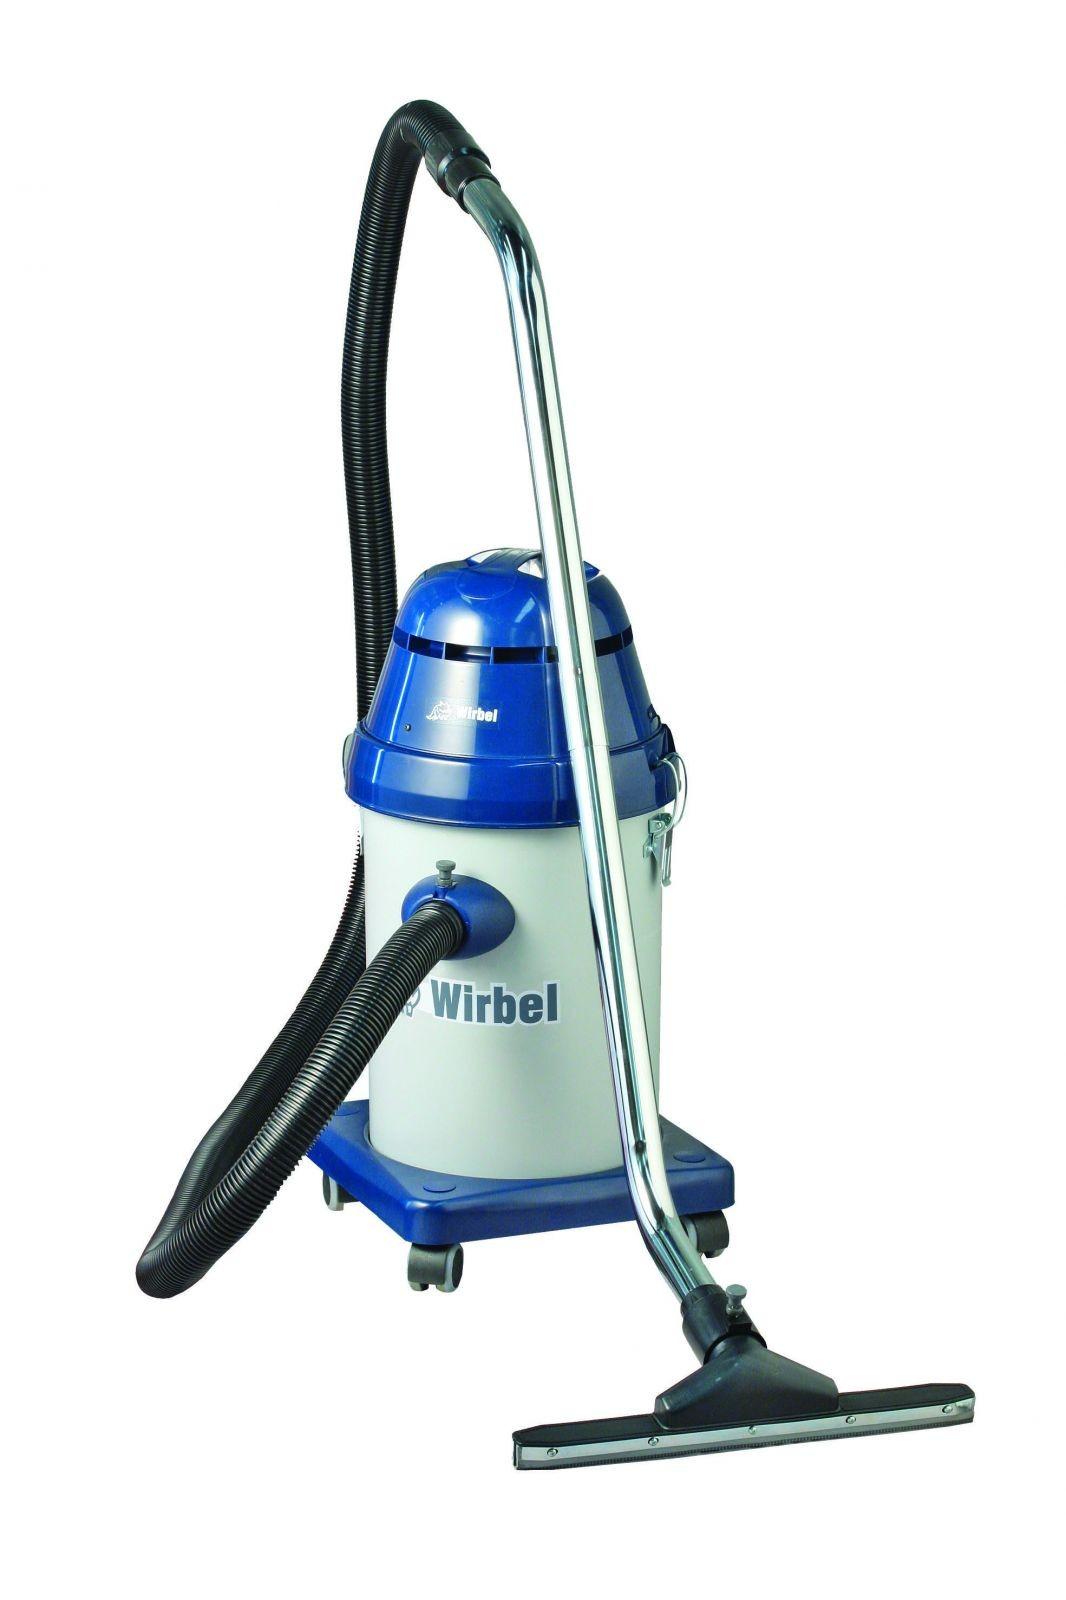 829 Plastic Wet & Dry Vacuum 110v